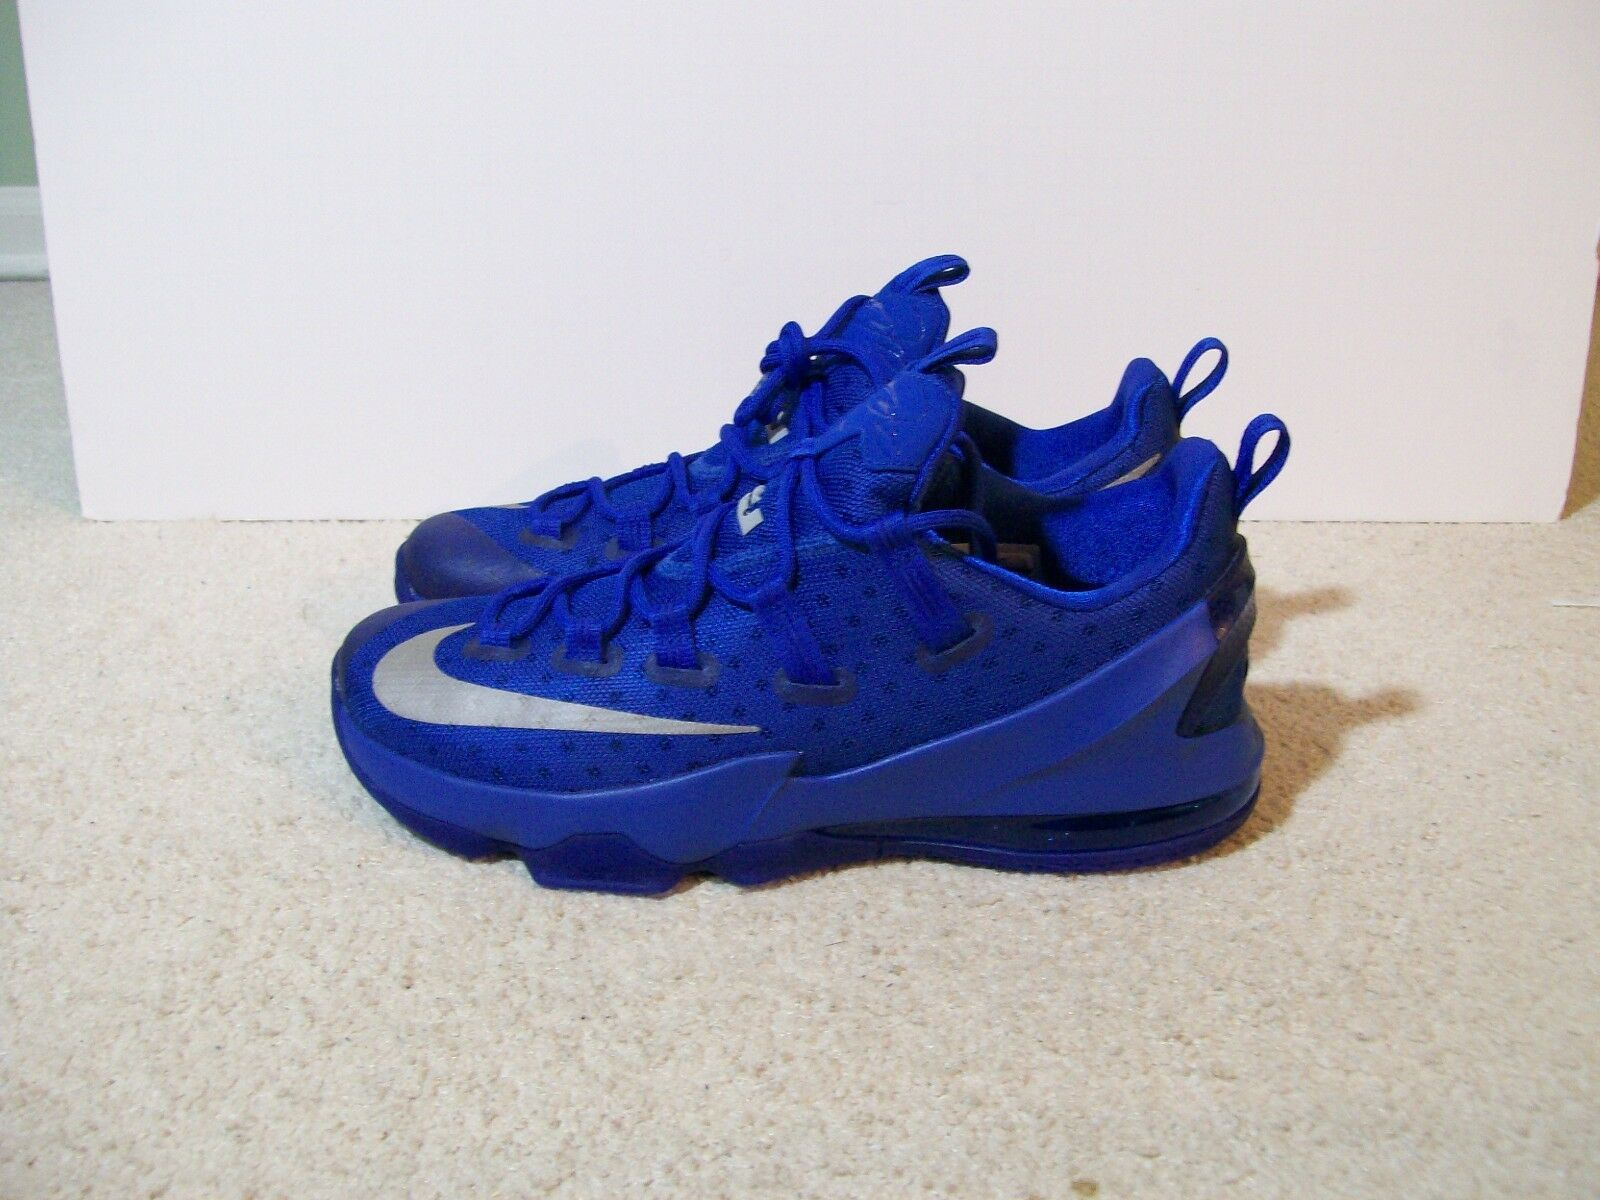 NEW Nike LeBron XIII 13 Low Game Royal bluee Kentucky 831925-400 XV XVI PRIME